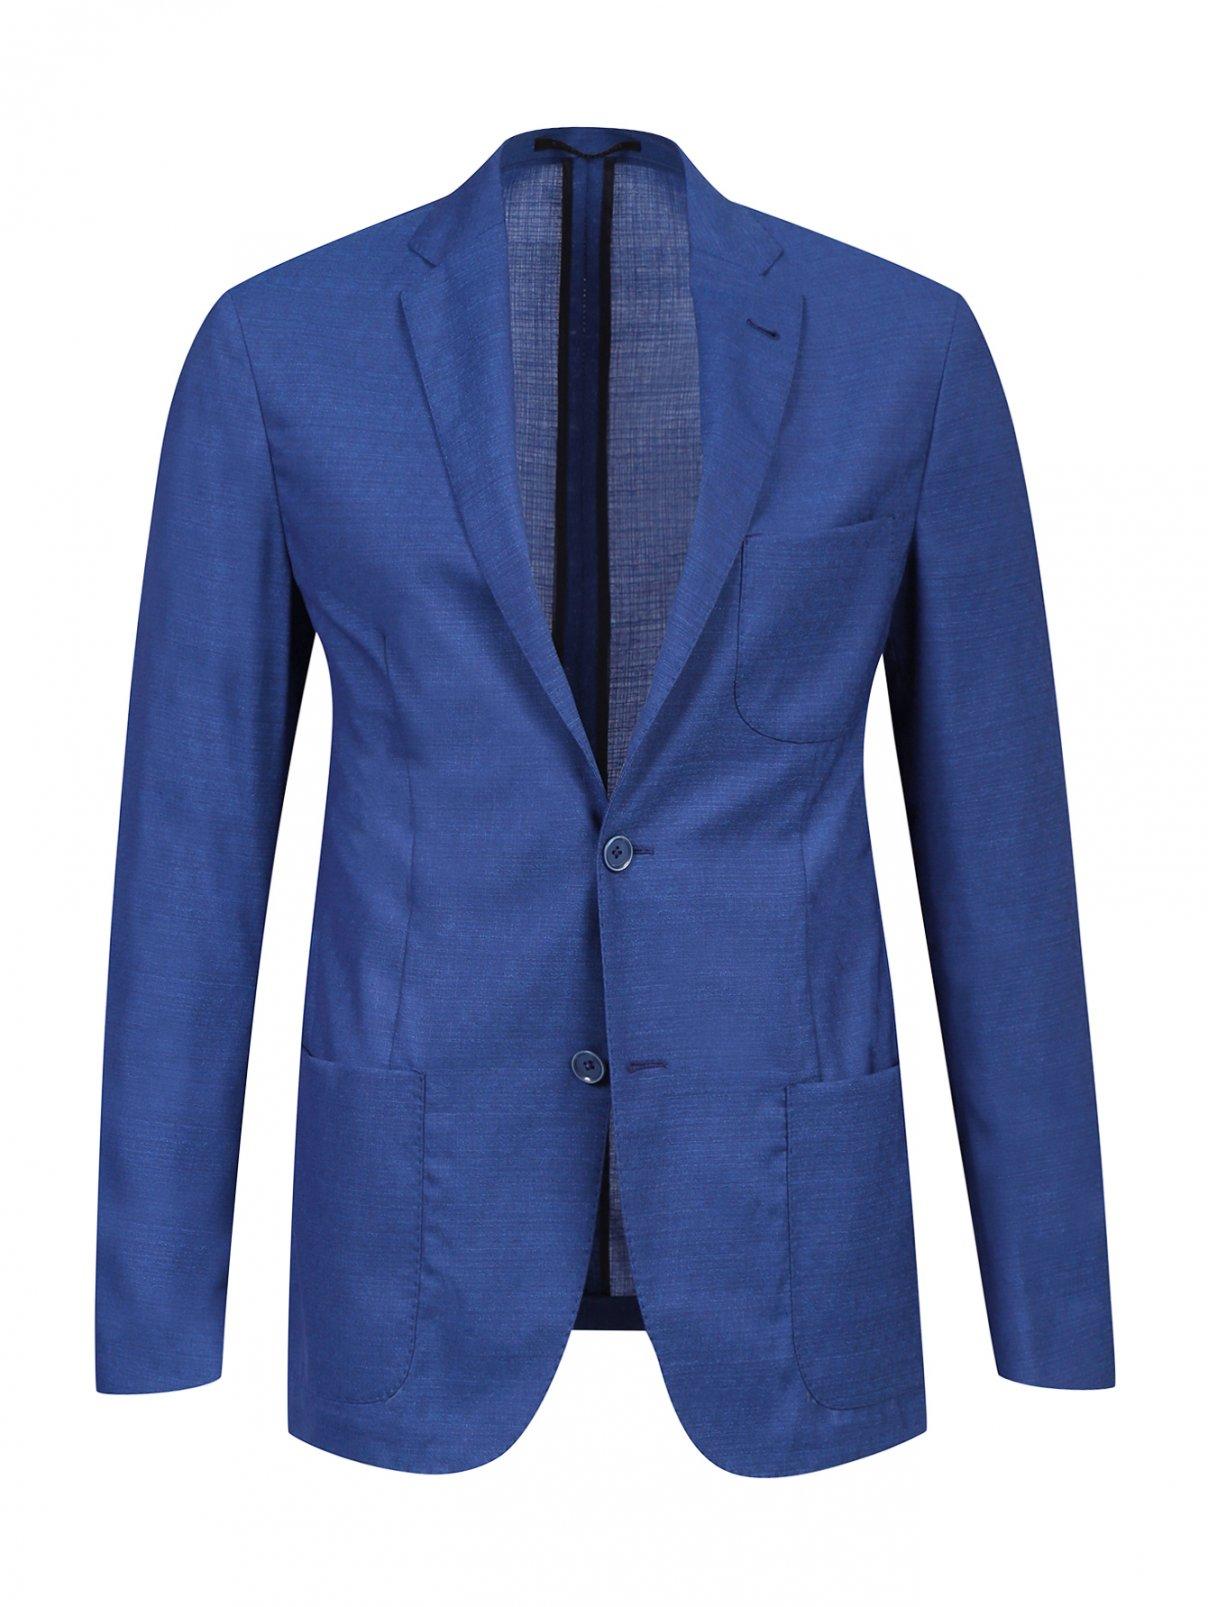 Легкий пиджак из шерсти Corneliani ID  –  Общий вид  – Цвет:  Синий